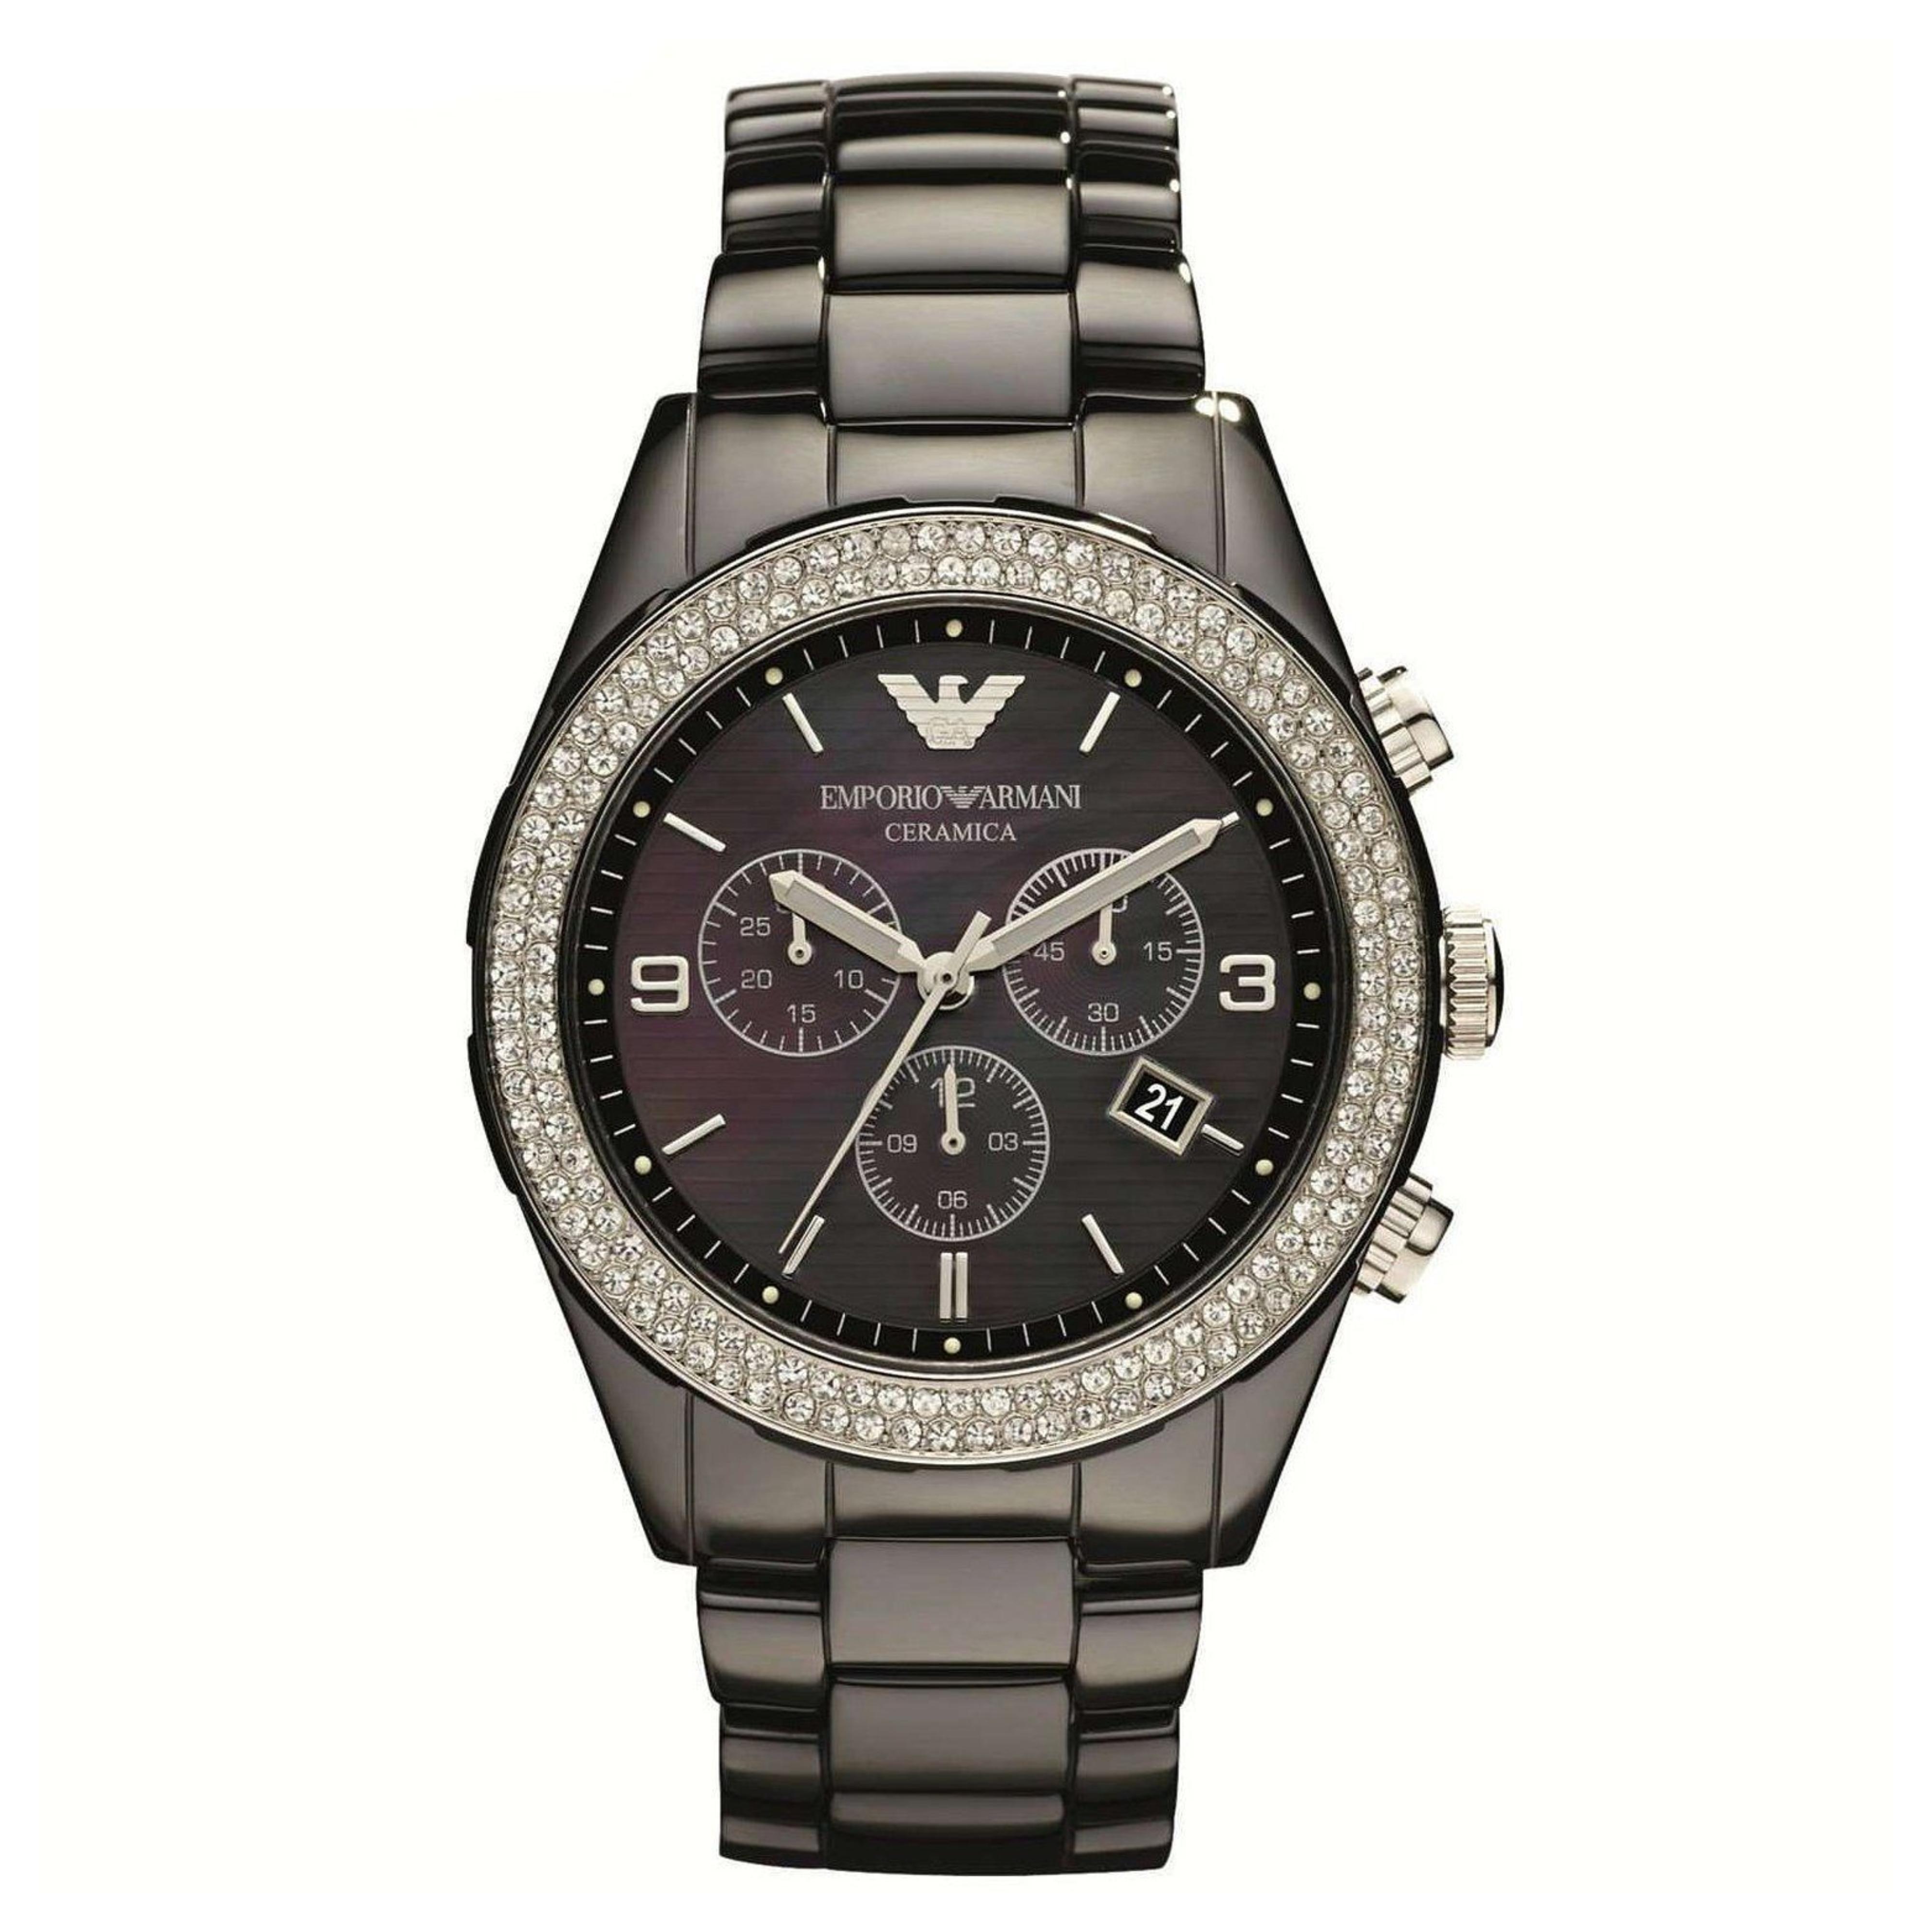 Emporio Armani Ceramica Ladies Watch | Mother of Pearl Dial | Ceramic Strap | AR1455